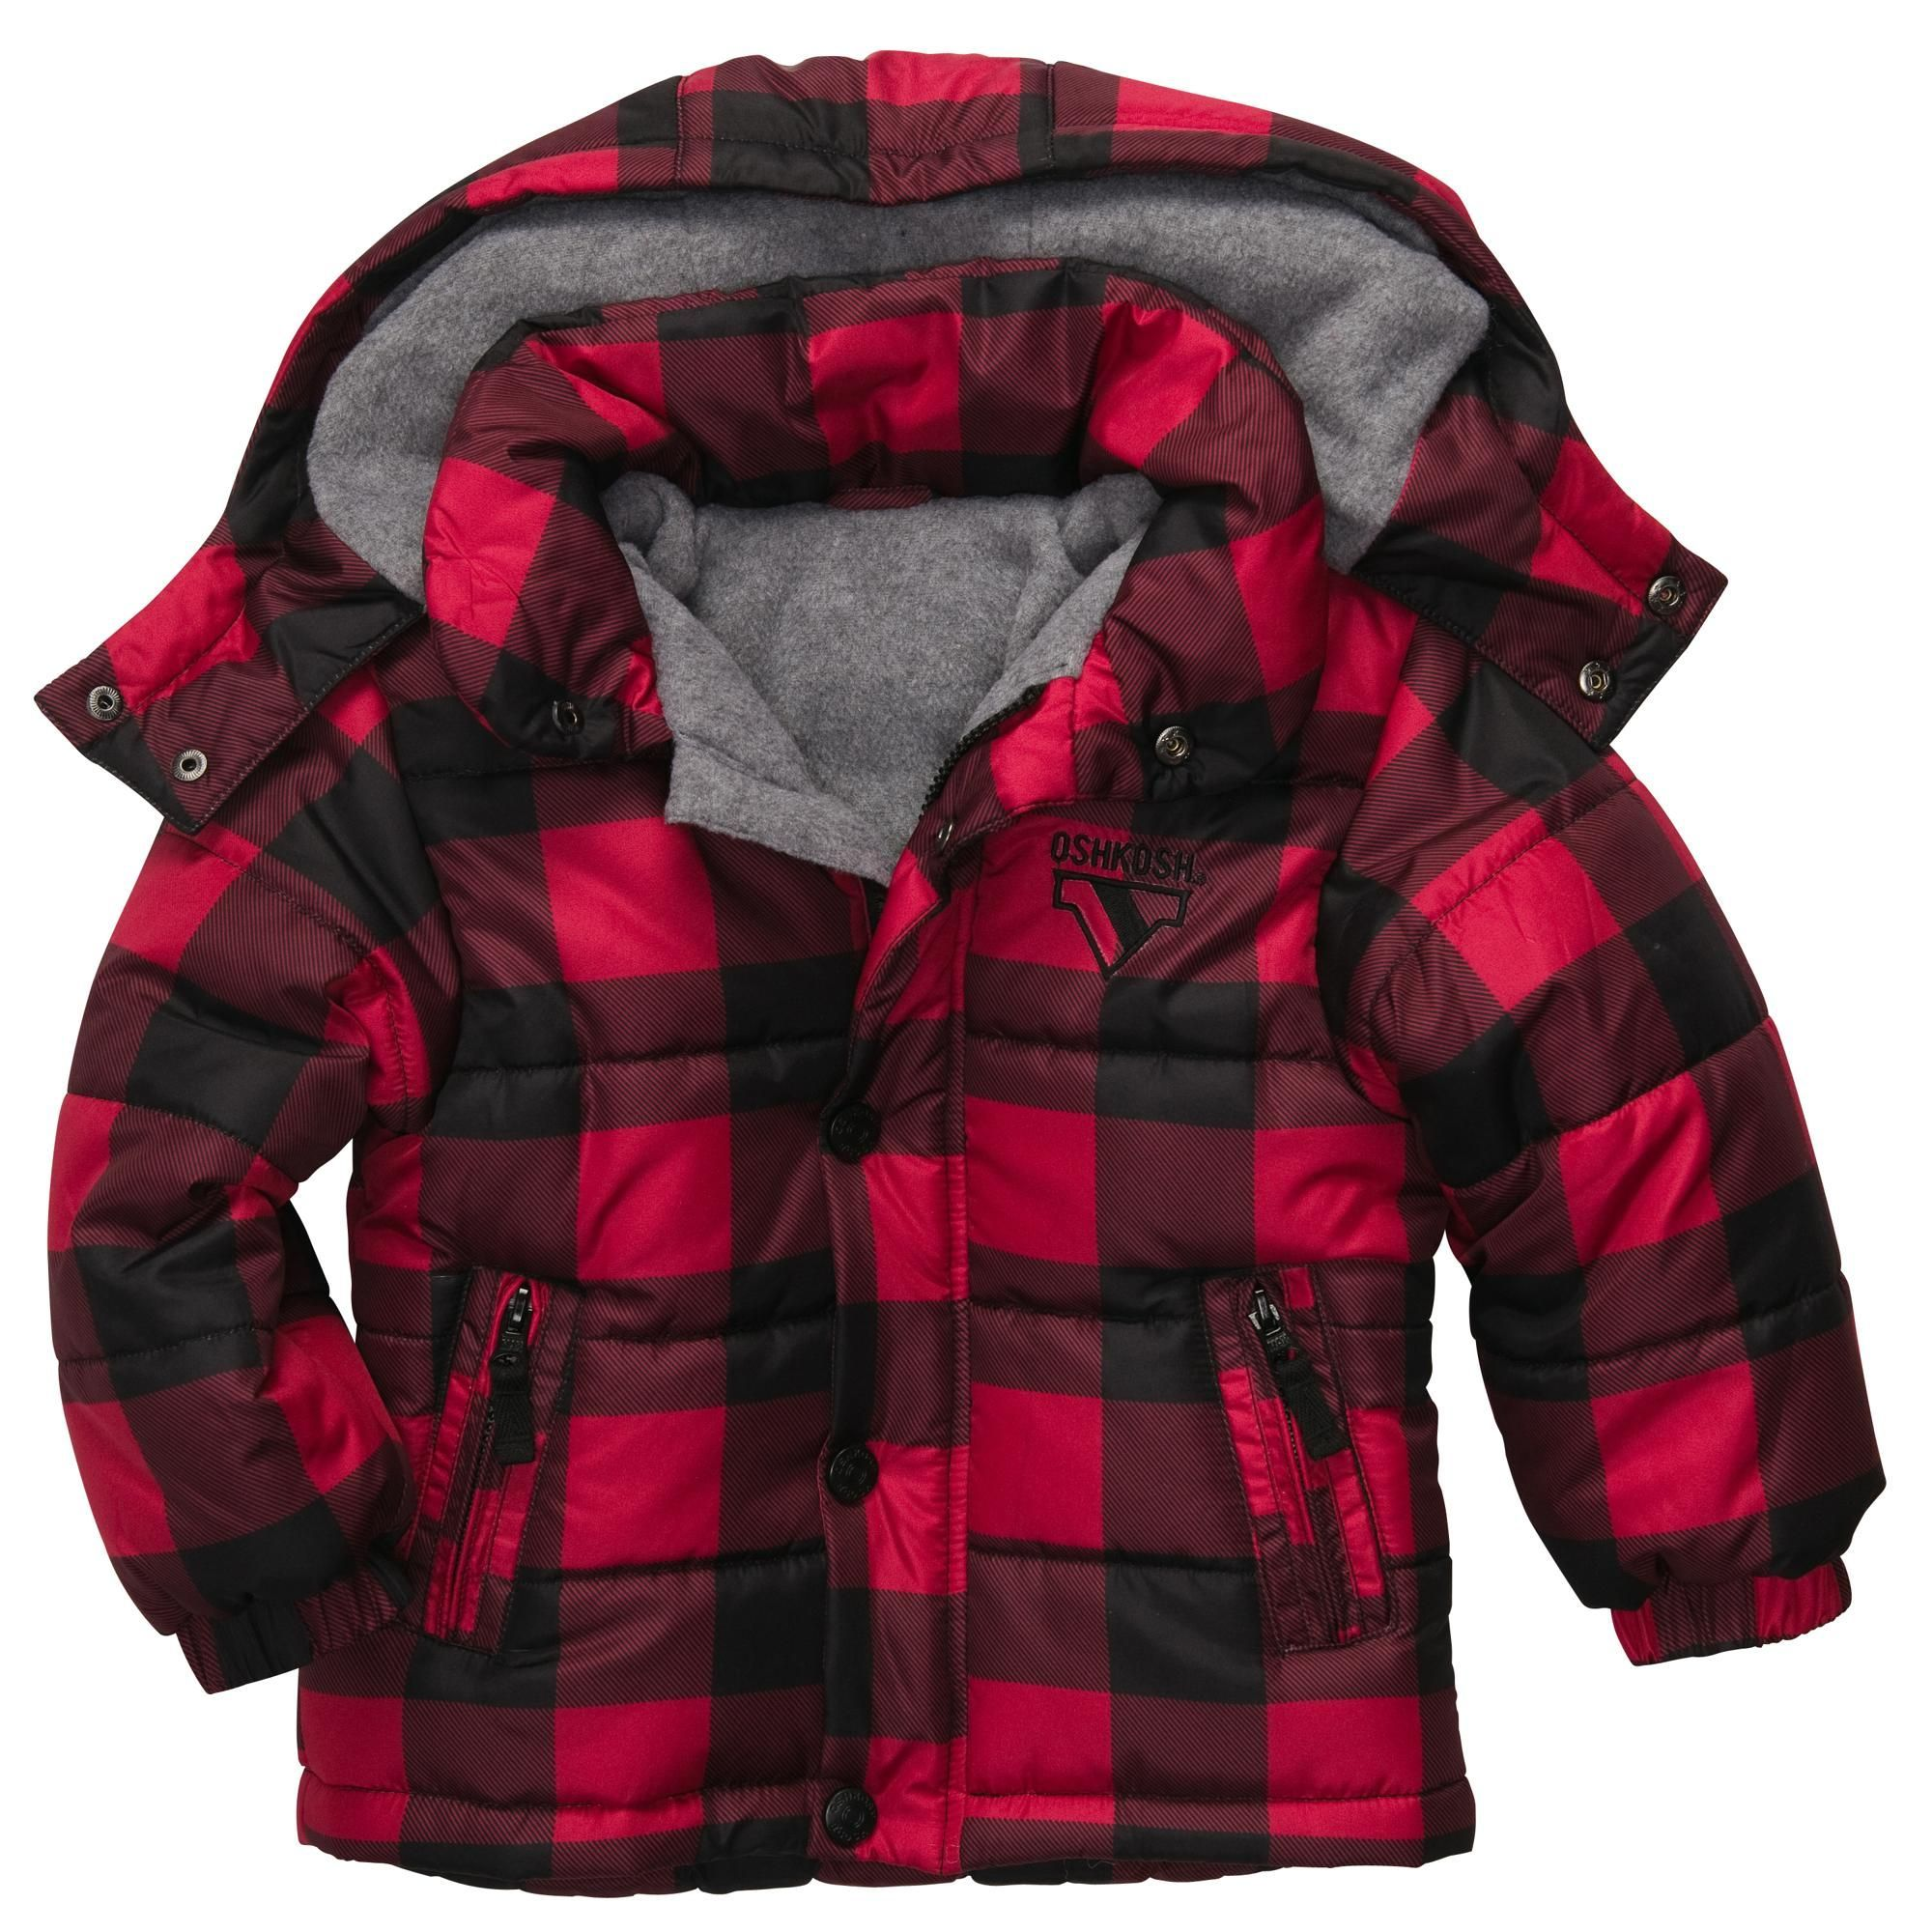 Buffalo Plaid Jacket Baby Boy Winter Shop Babyclothes Baby Boy Jackets Baby Boy Outfits Baby Outerwear [ 2000 x 2000 Pixel ]